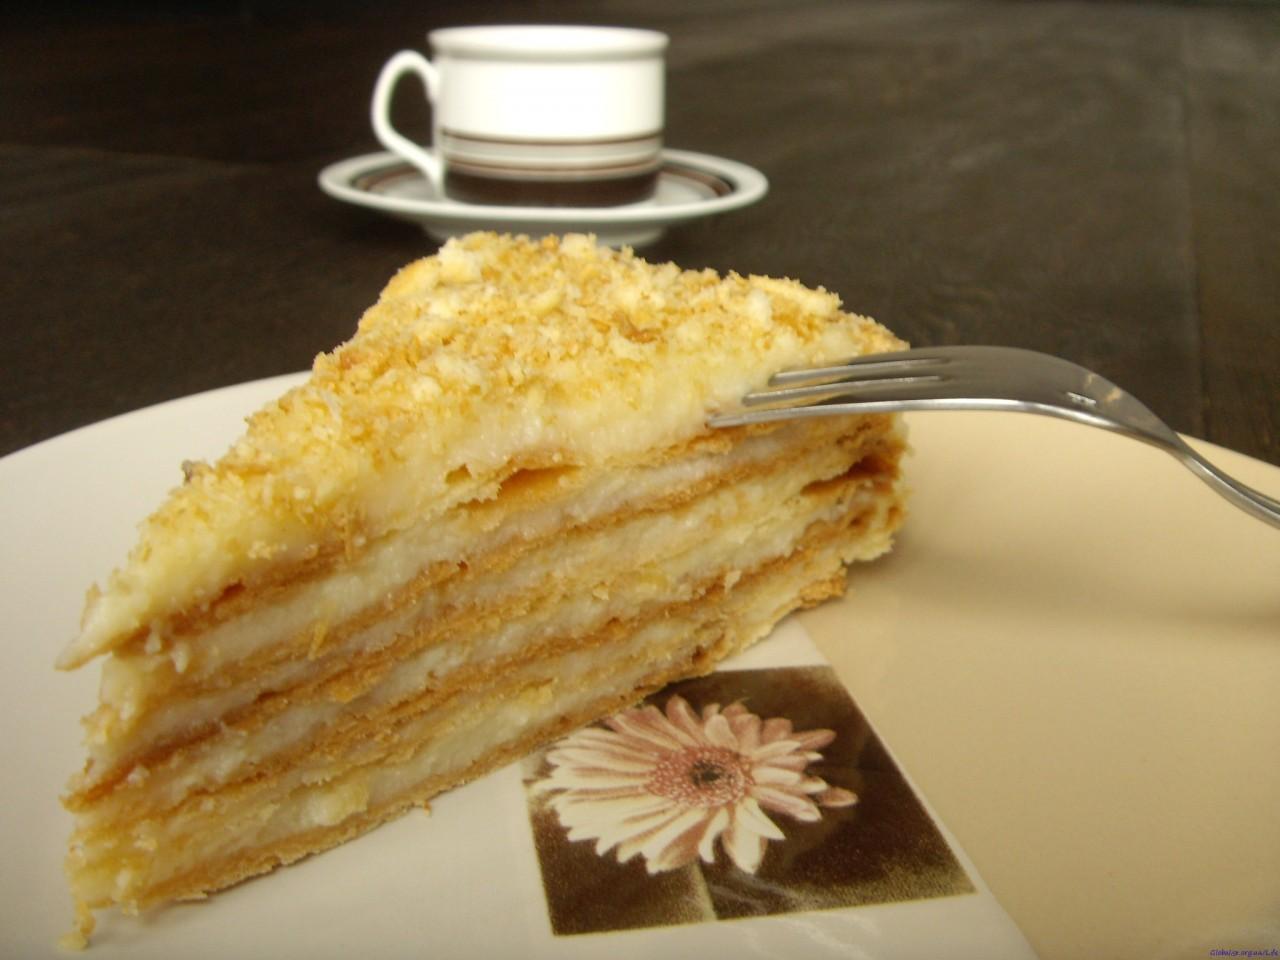 Как, не имея духовки, испечь торт «Наполеон»